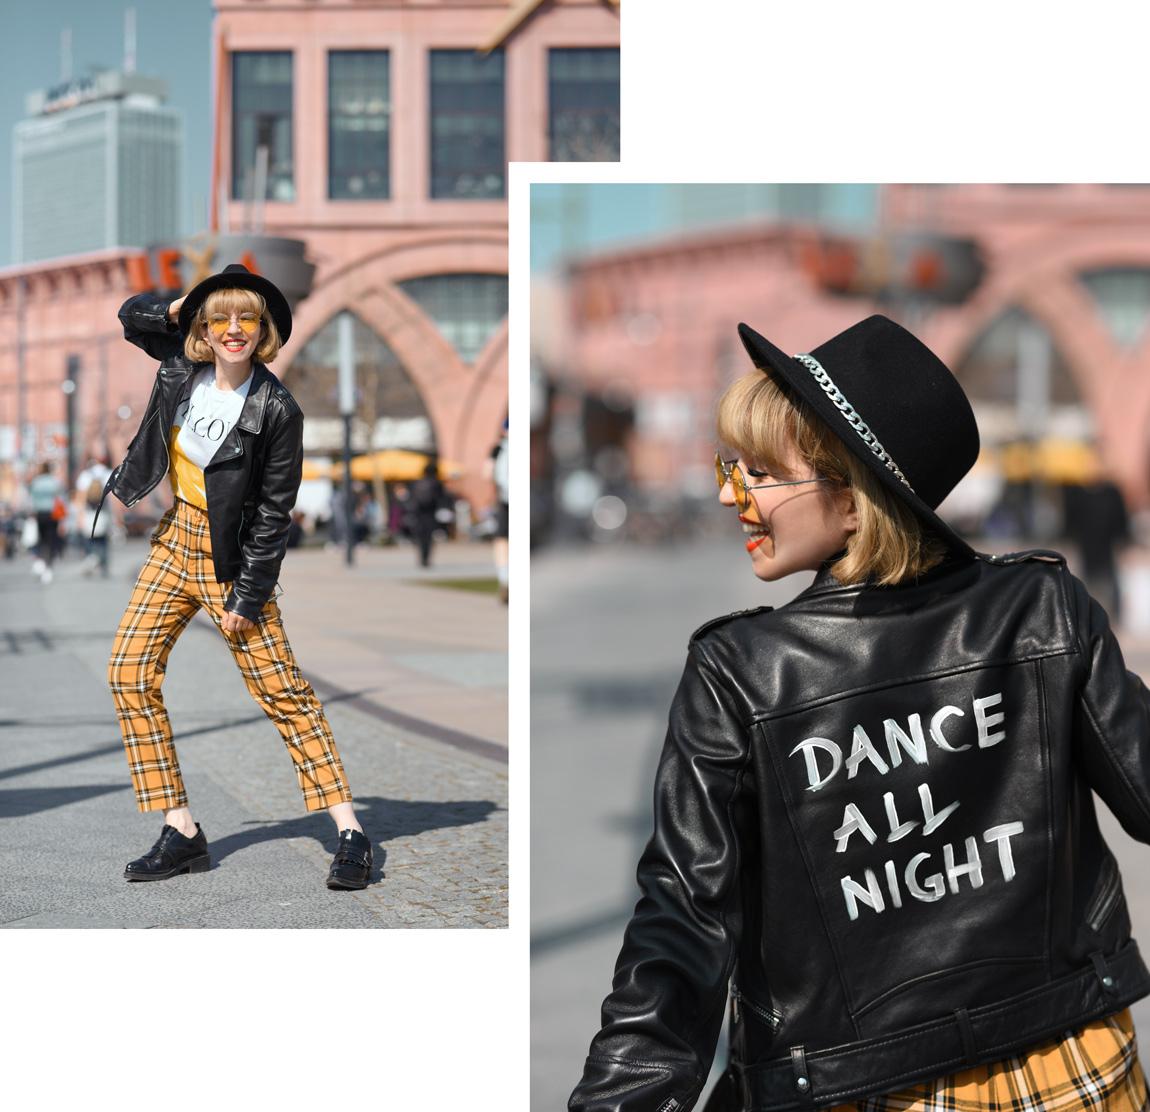 shoppen, in, berlin, diy, event, alexa, lederjacke, modeblogger, fashionblogger, fashionblog, dance, outfit, streetstyle, outfitinspiration, suess, vintage, karo, gelb, bershka, zara, shopping, shoppen, einkaufszentrum